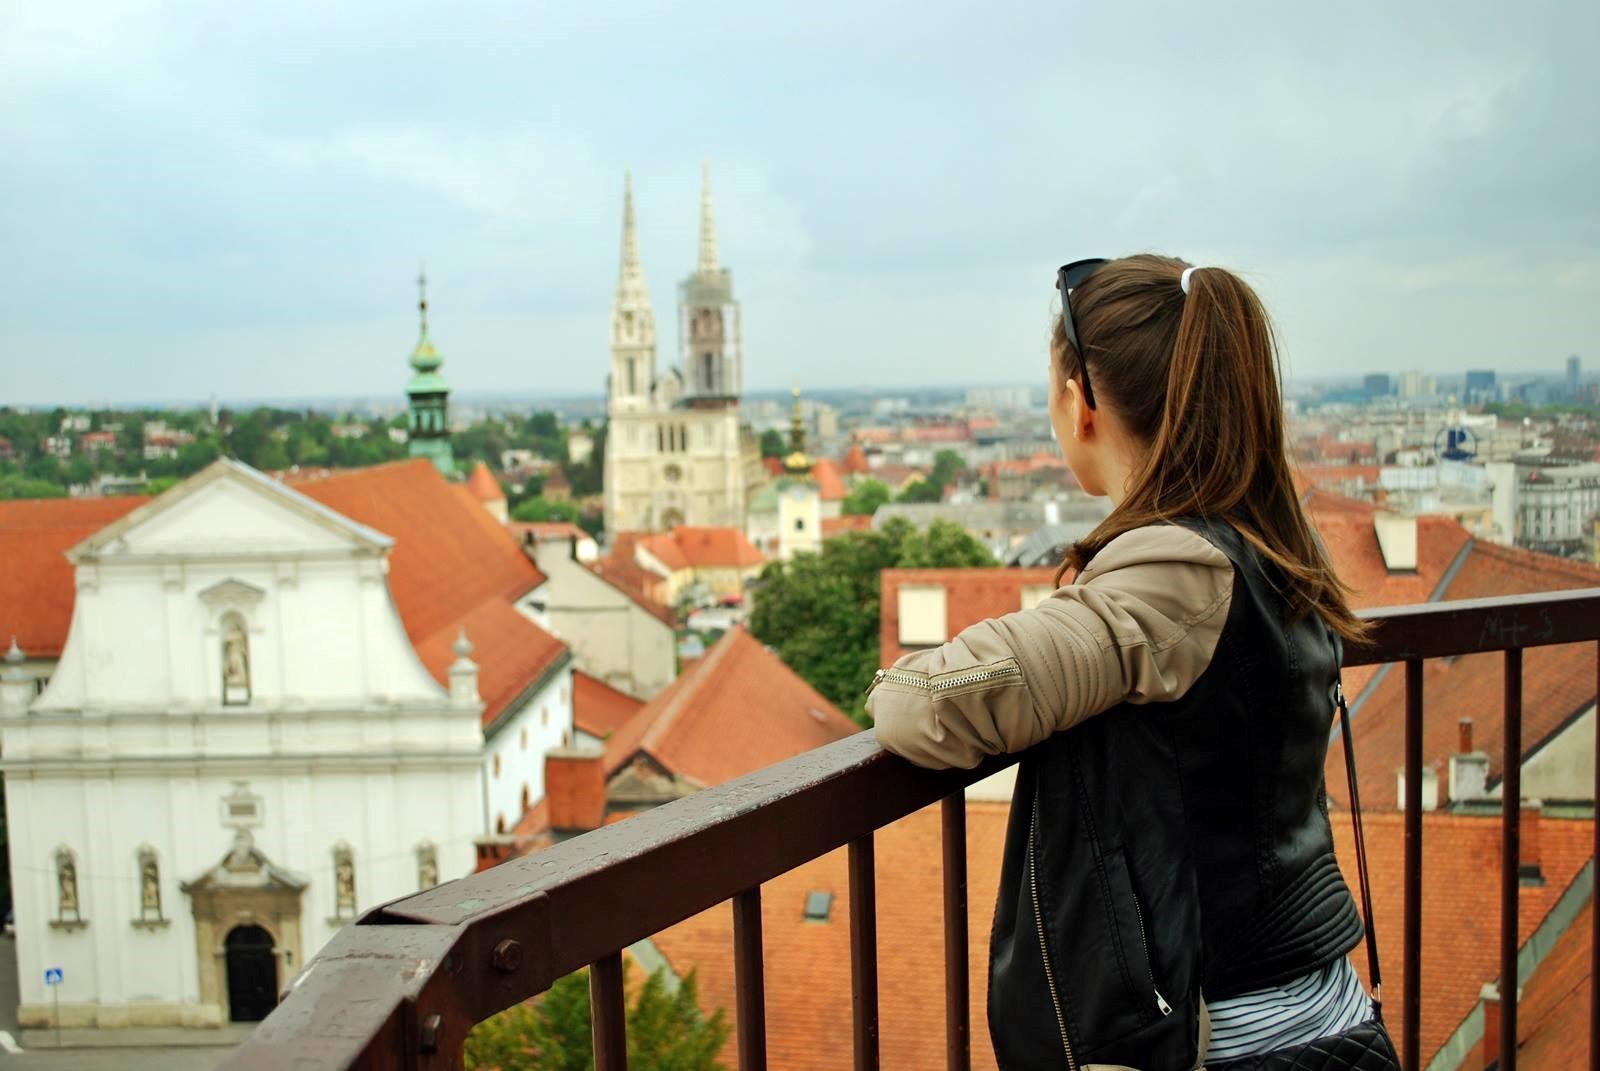 Blitz Interview, Mariya Stoyanova, ASTOM, Featured Image, Travelling Buzz